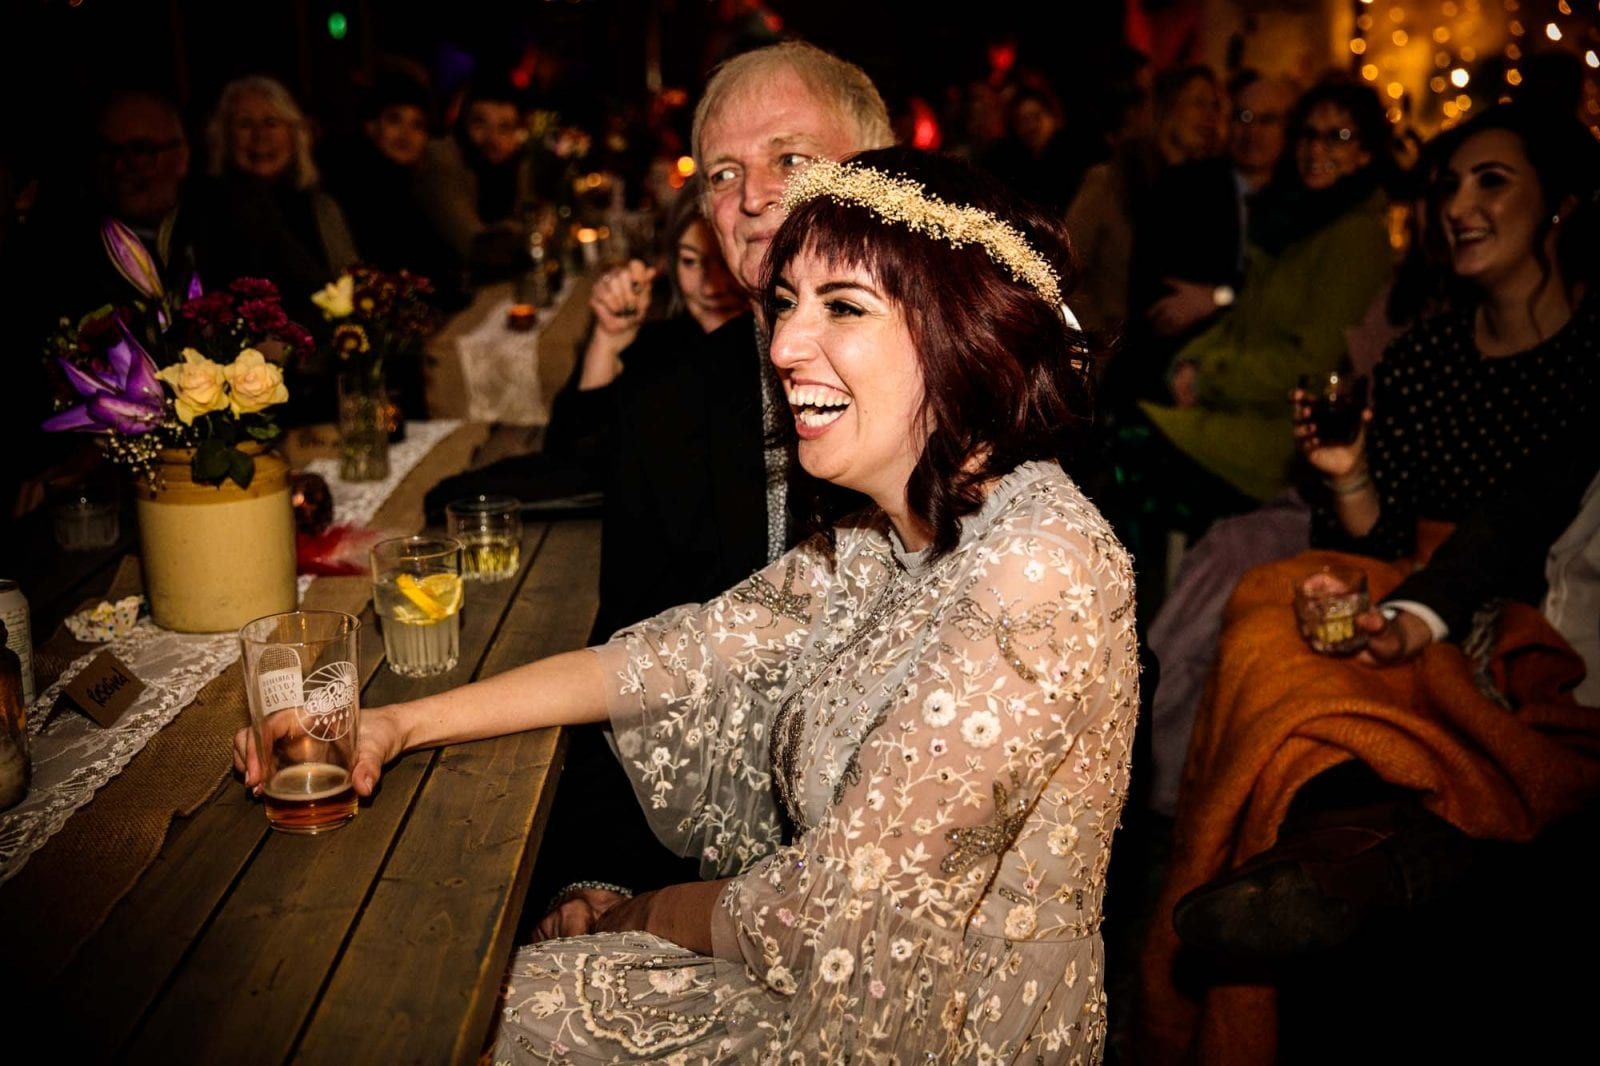 Alternative bride laughing during wedding speech